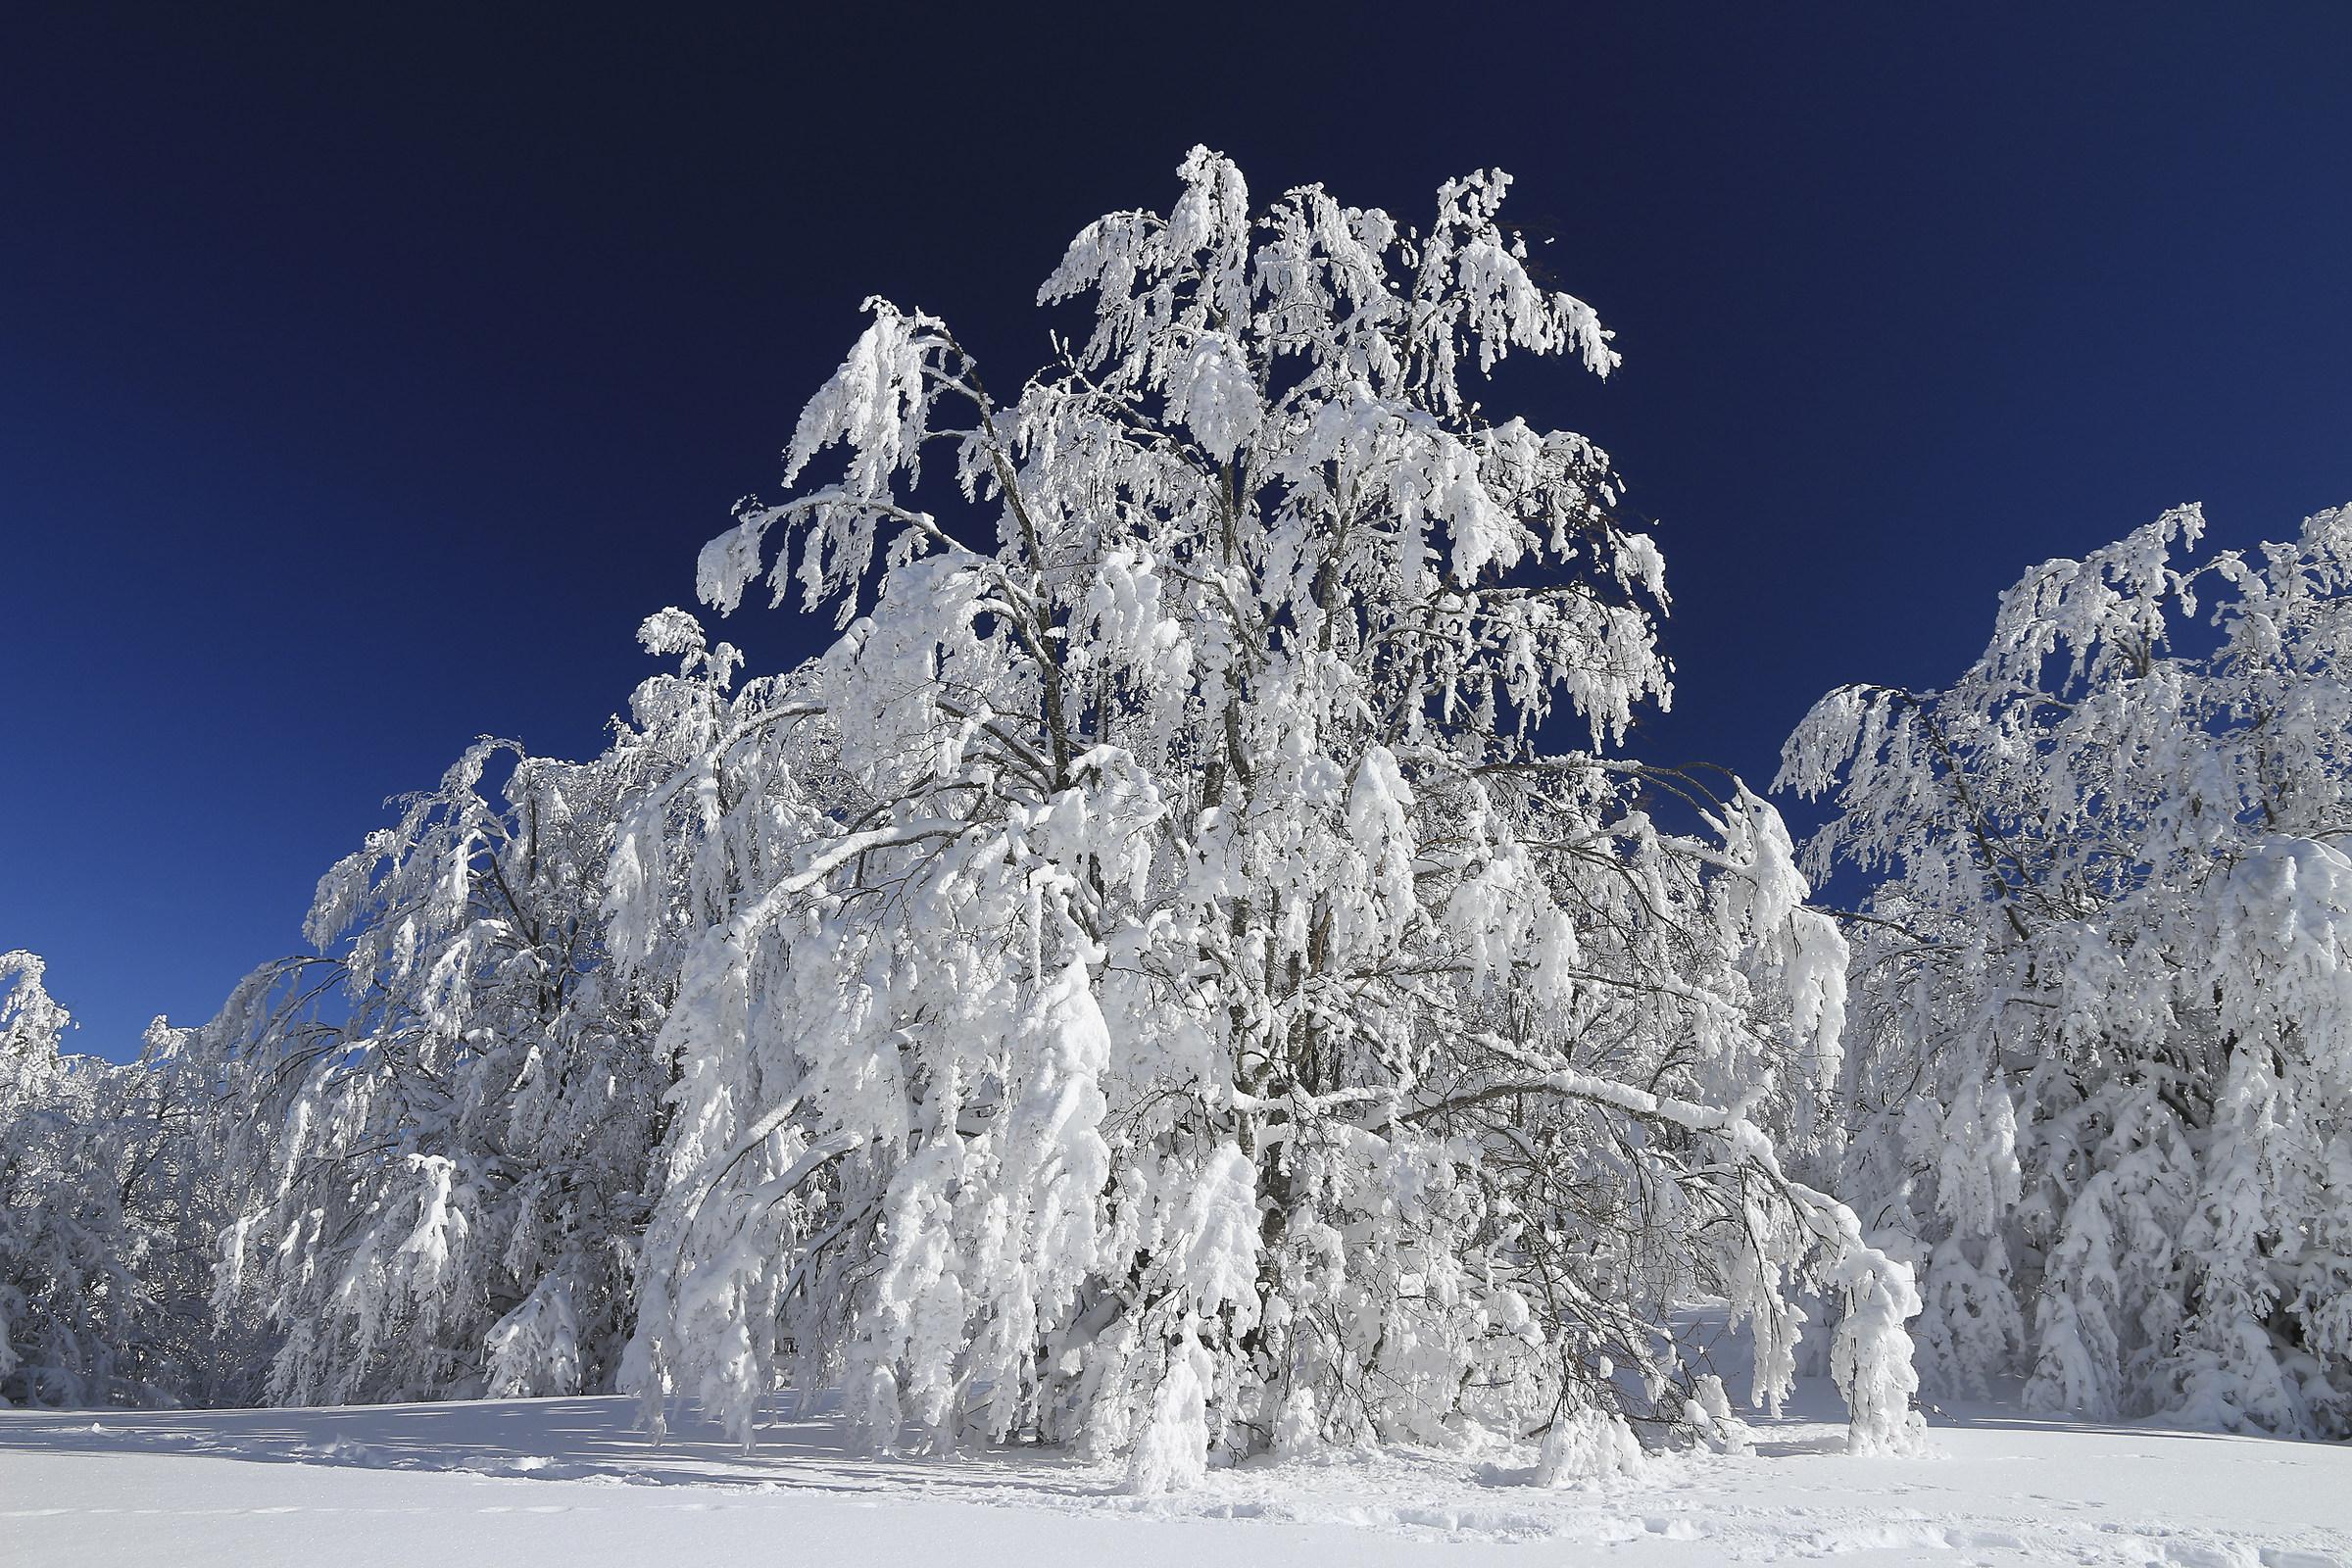 The crystal tree...